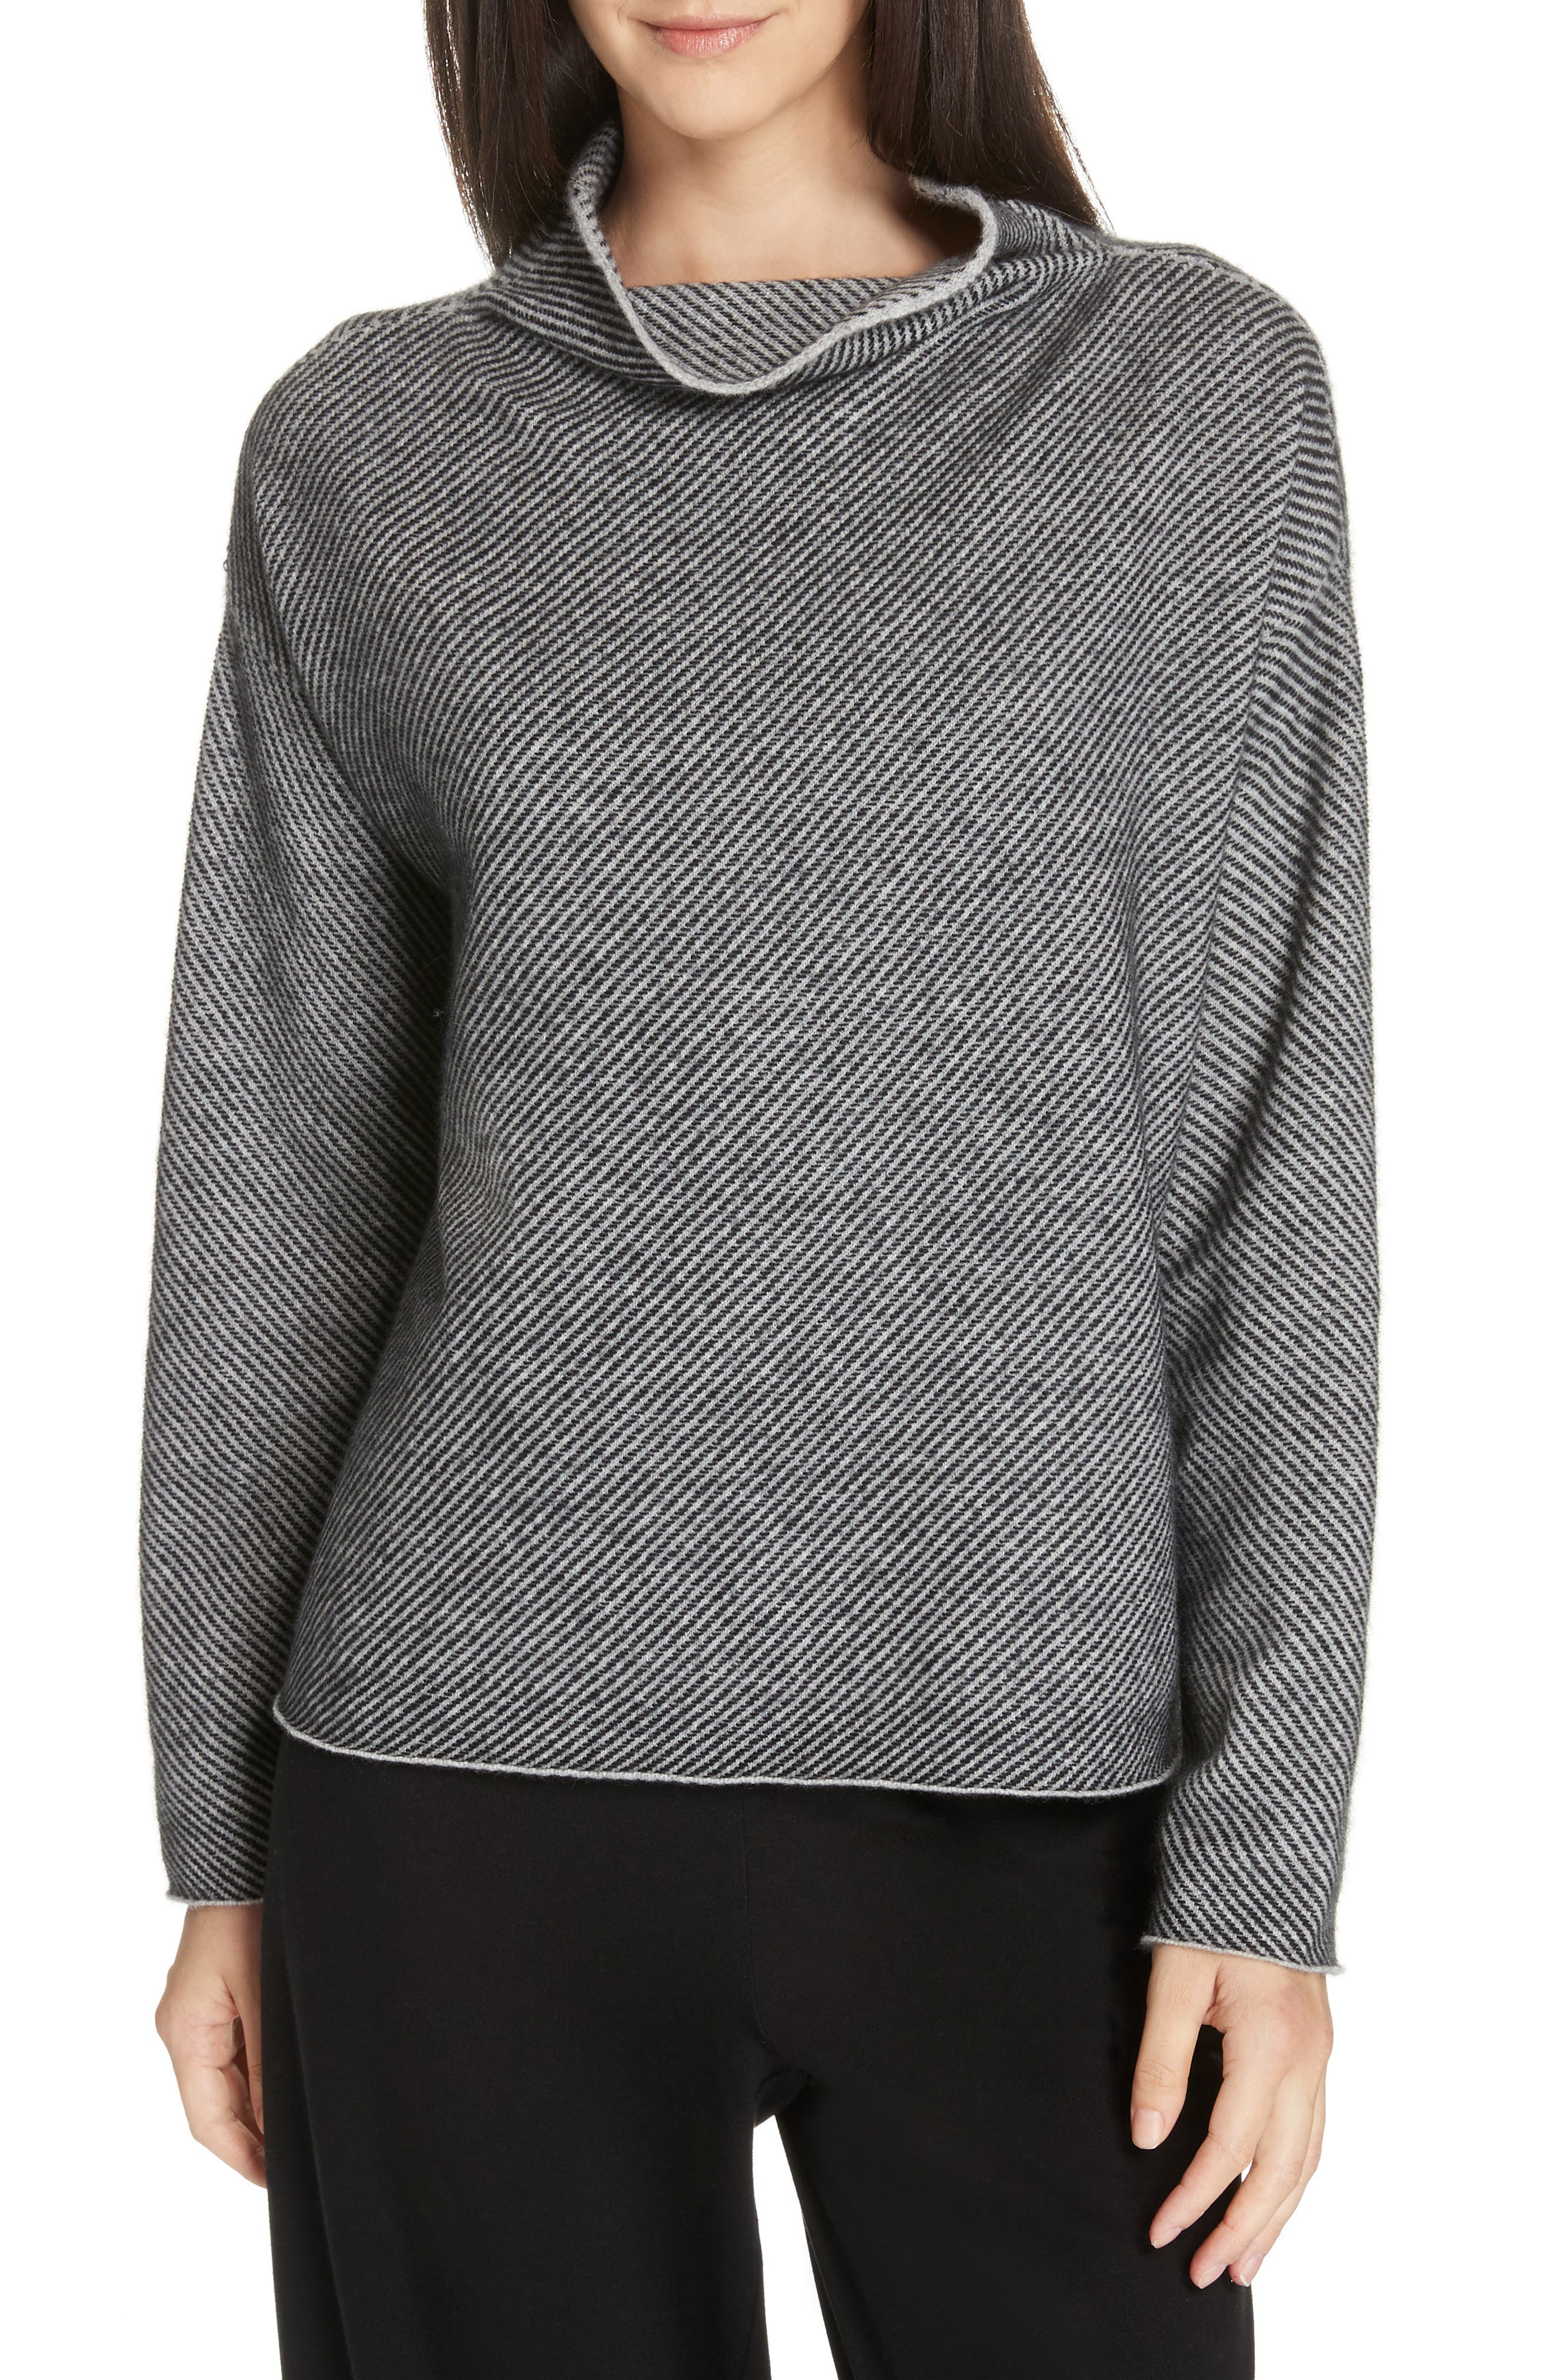 Eileen Fisher Cashmere & Wool Sweater, Grey